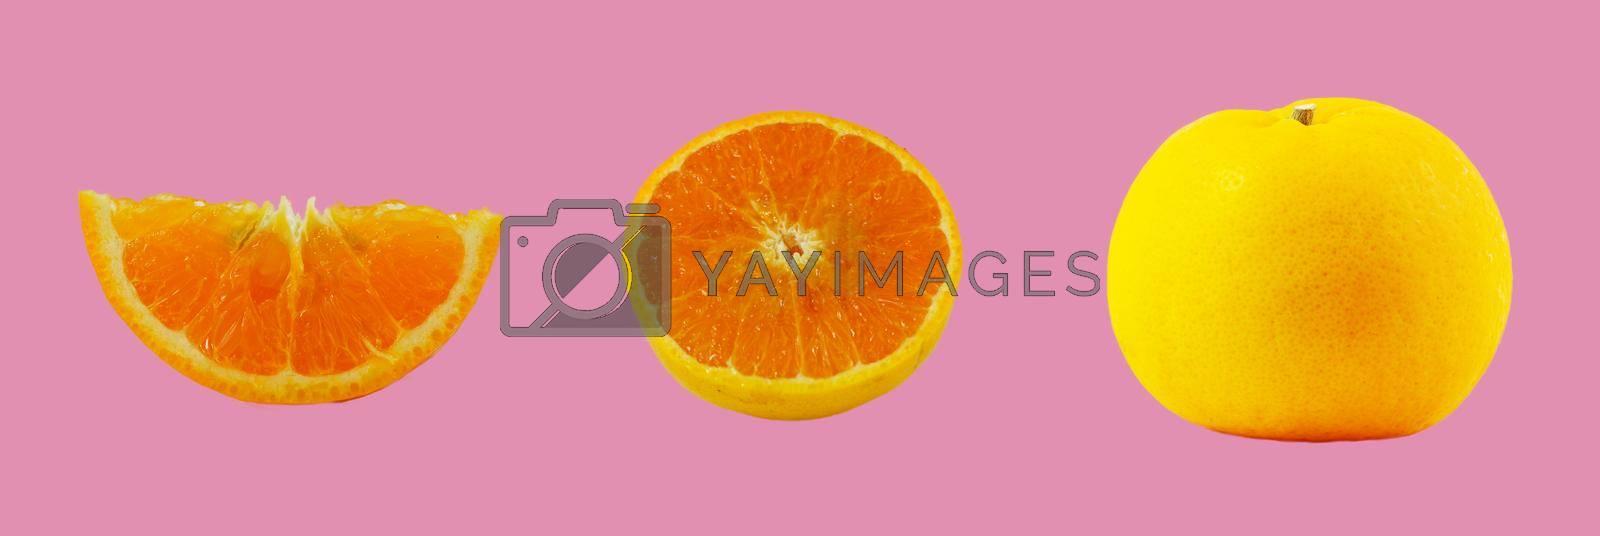 Orange fruit and orange halves Isolated on pink background Natural refreshing fruit concept containing Vitamin C.